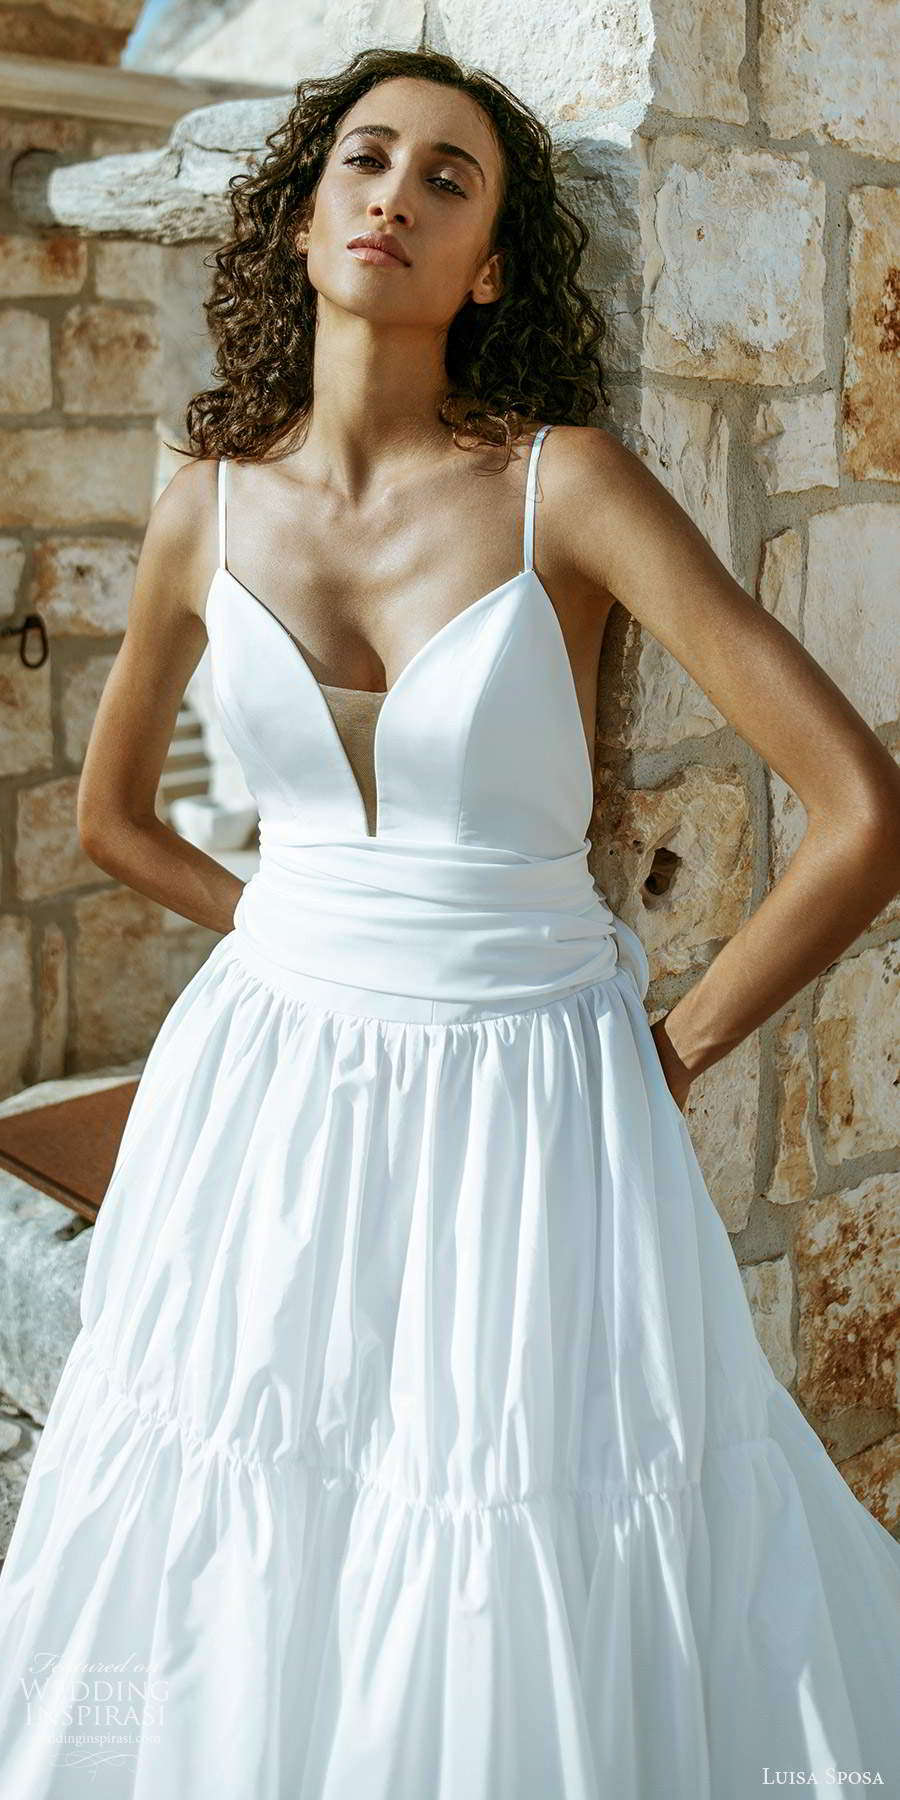 luisa sposa 2021 bridal sleeveless thin straps plunging sweetheart neckline clean minimalist a line ball gown wedding dress (8) lv